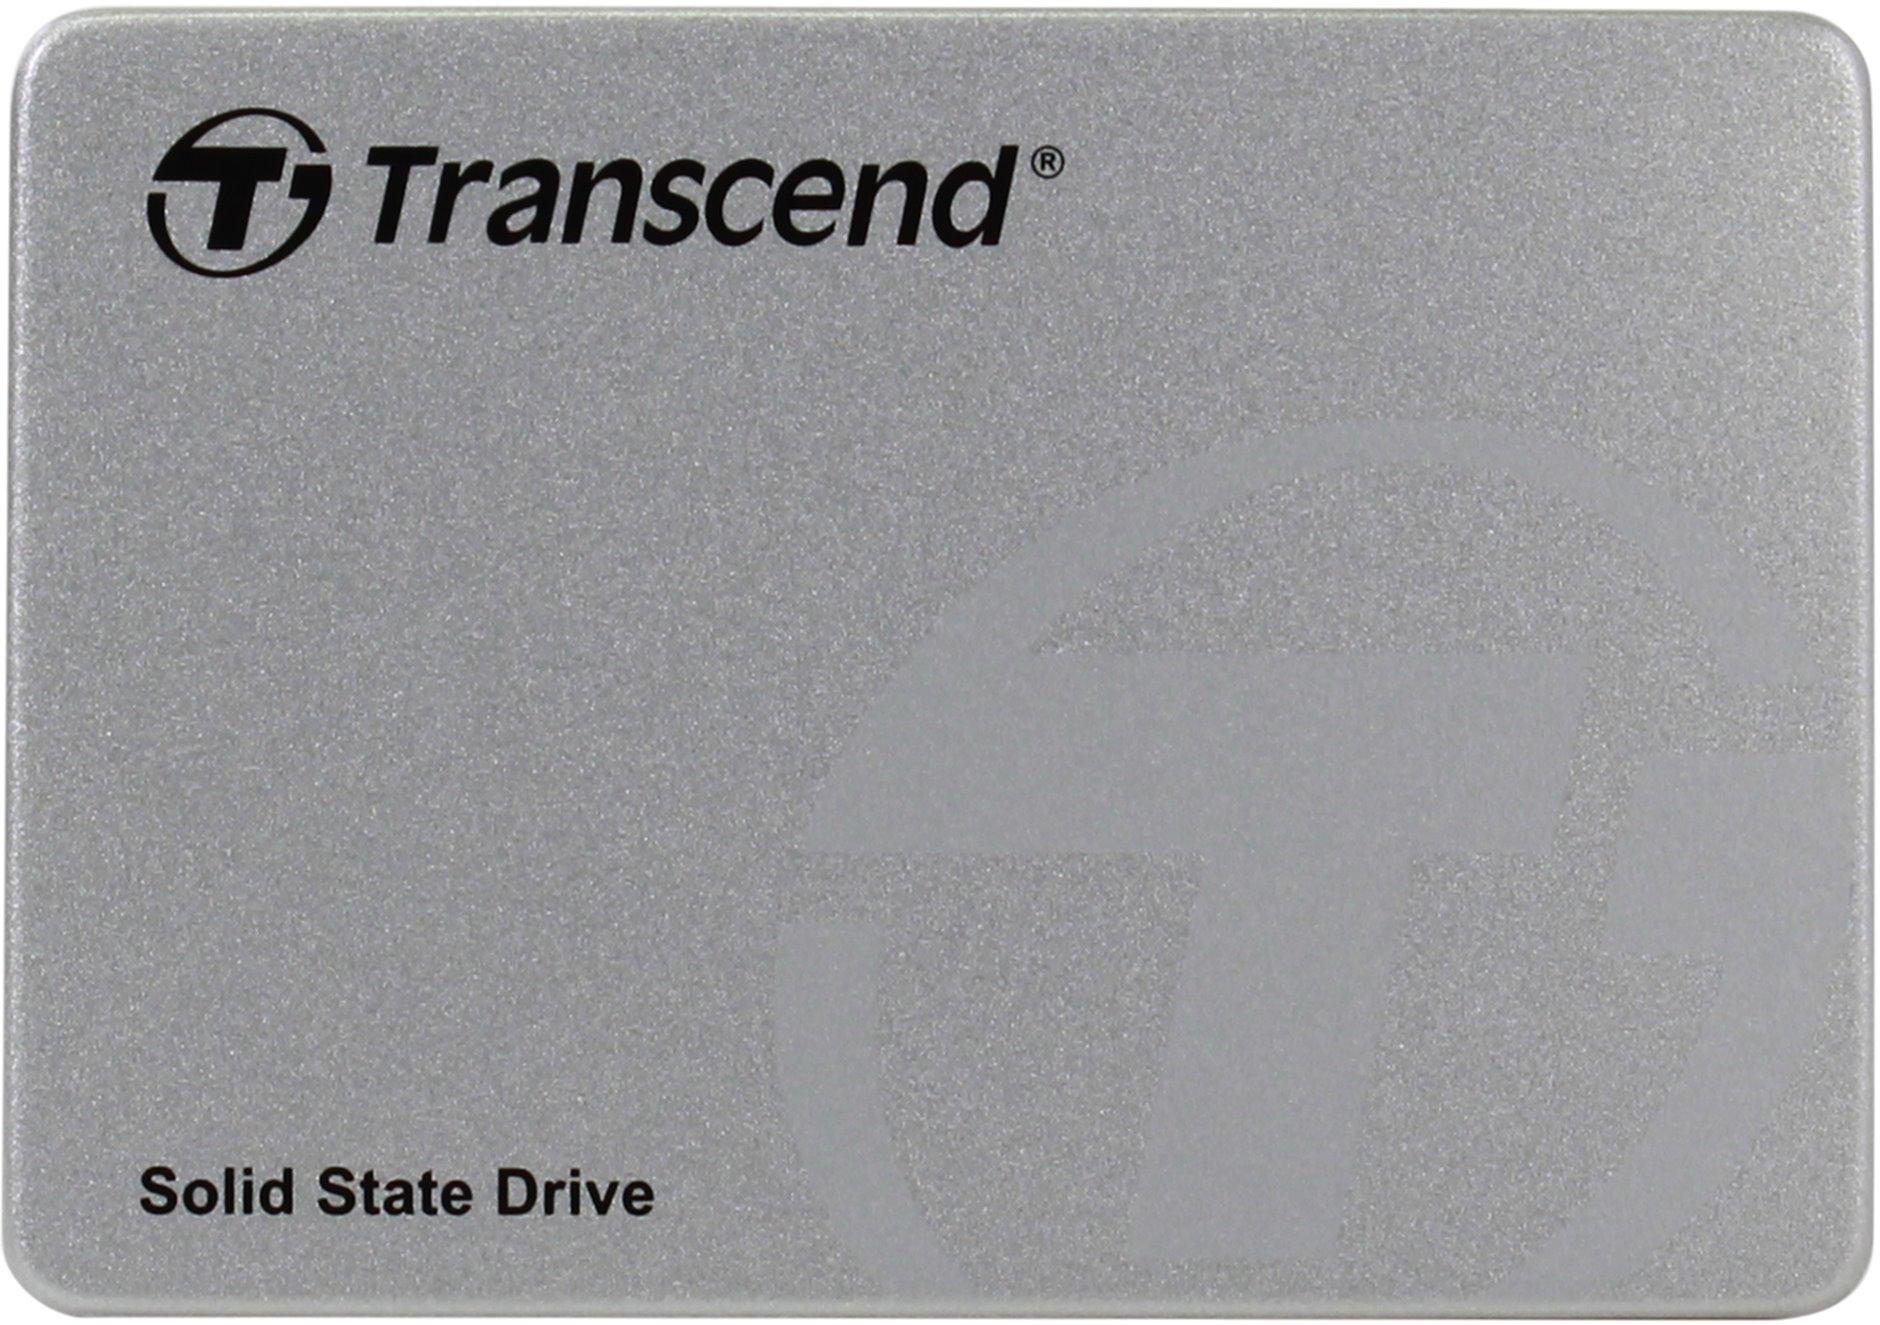 SSDВнешние диски SSD<br>SSD-накопитель<br>